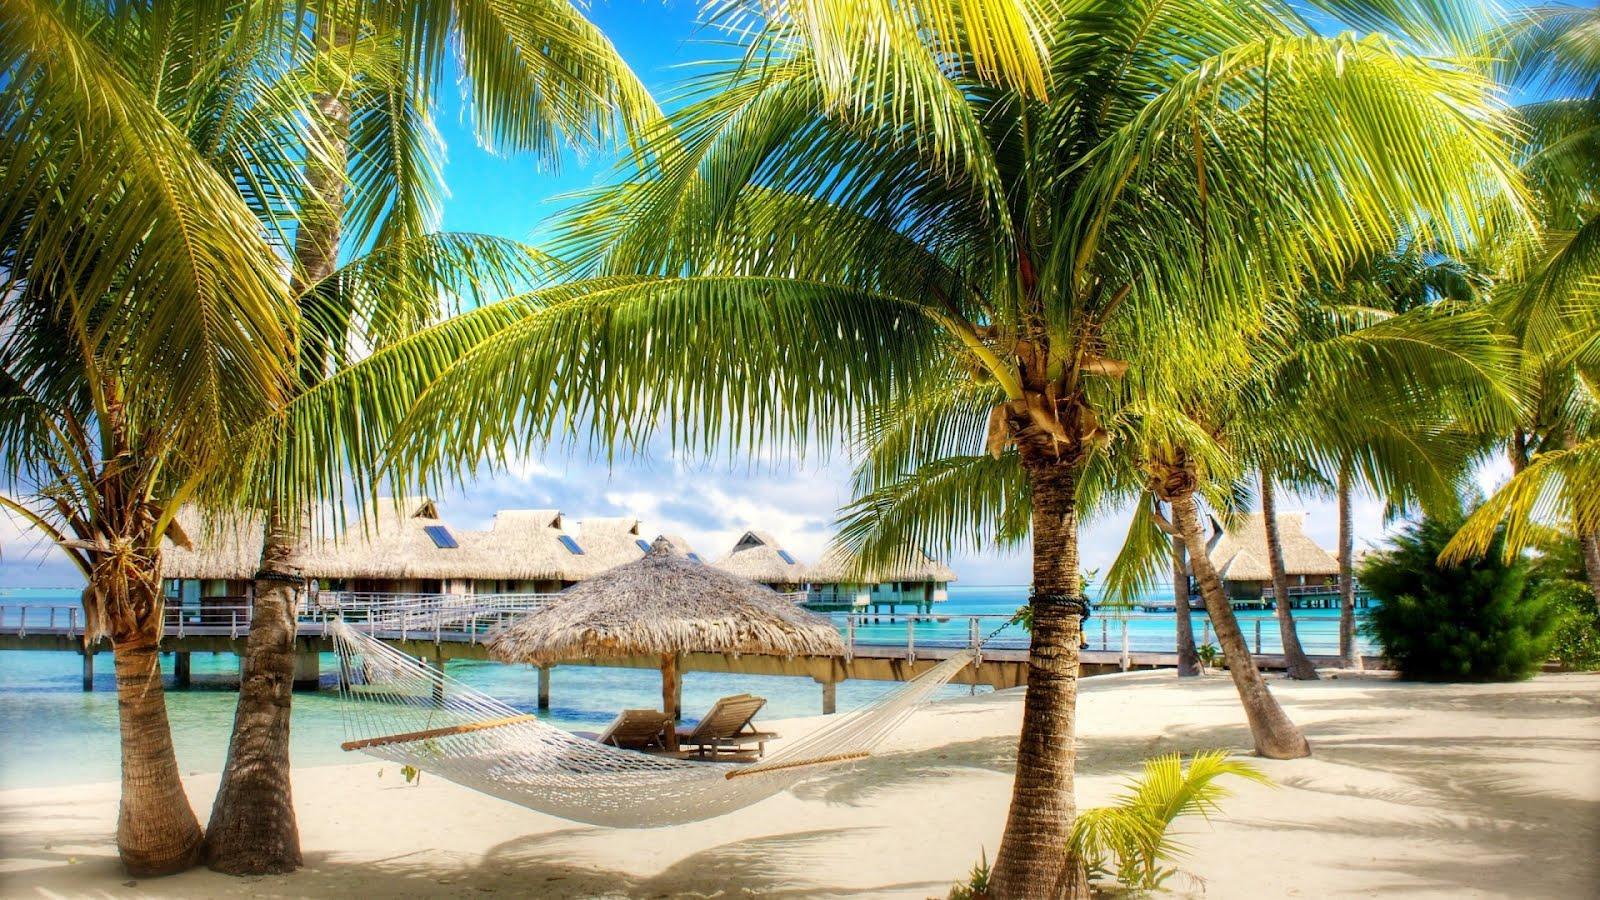 Hd Tropical Island Beach Paradise Wallpapers And Backgrounds: Tropical Beach, Paradise Wallpaper